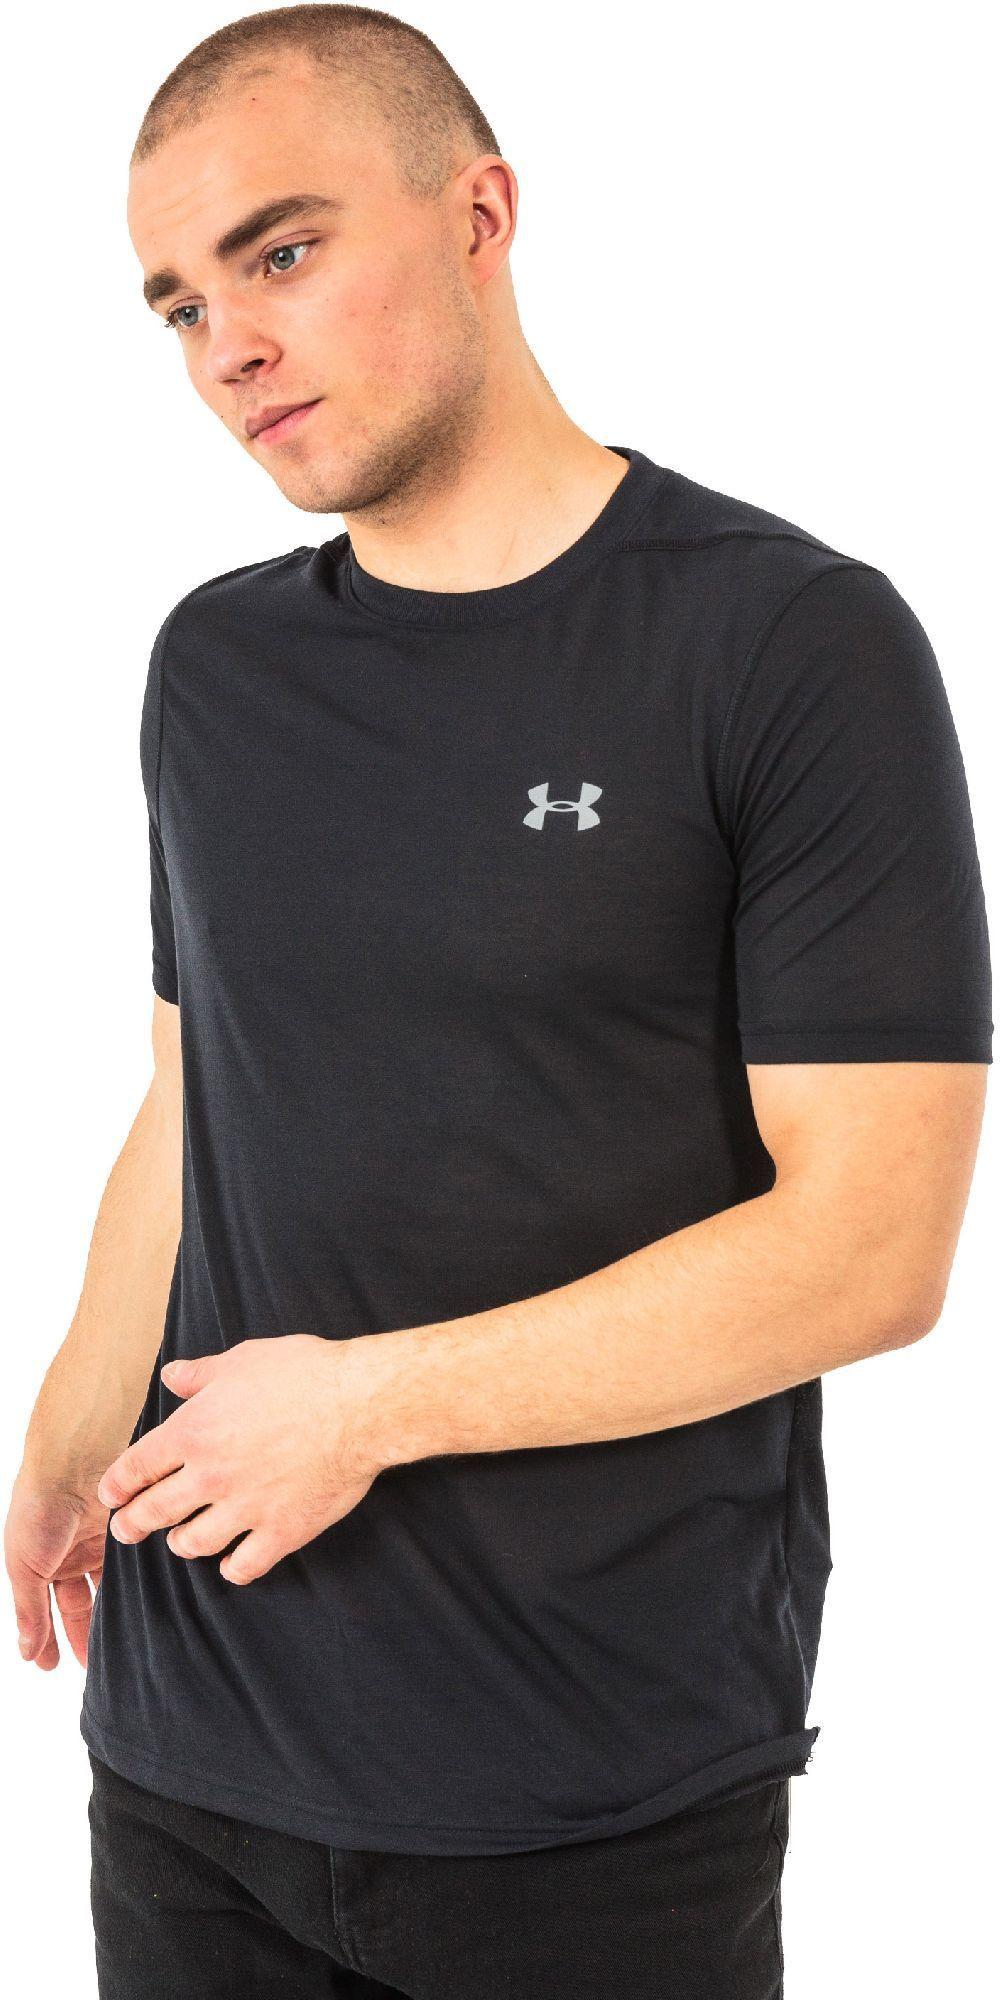 Under Armour Koszulka męska Threadborne T-Shirt Black/Graphite r. L (1289588001) 1